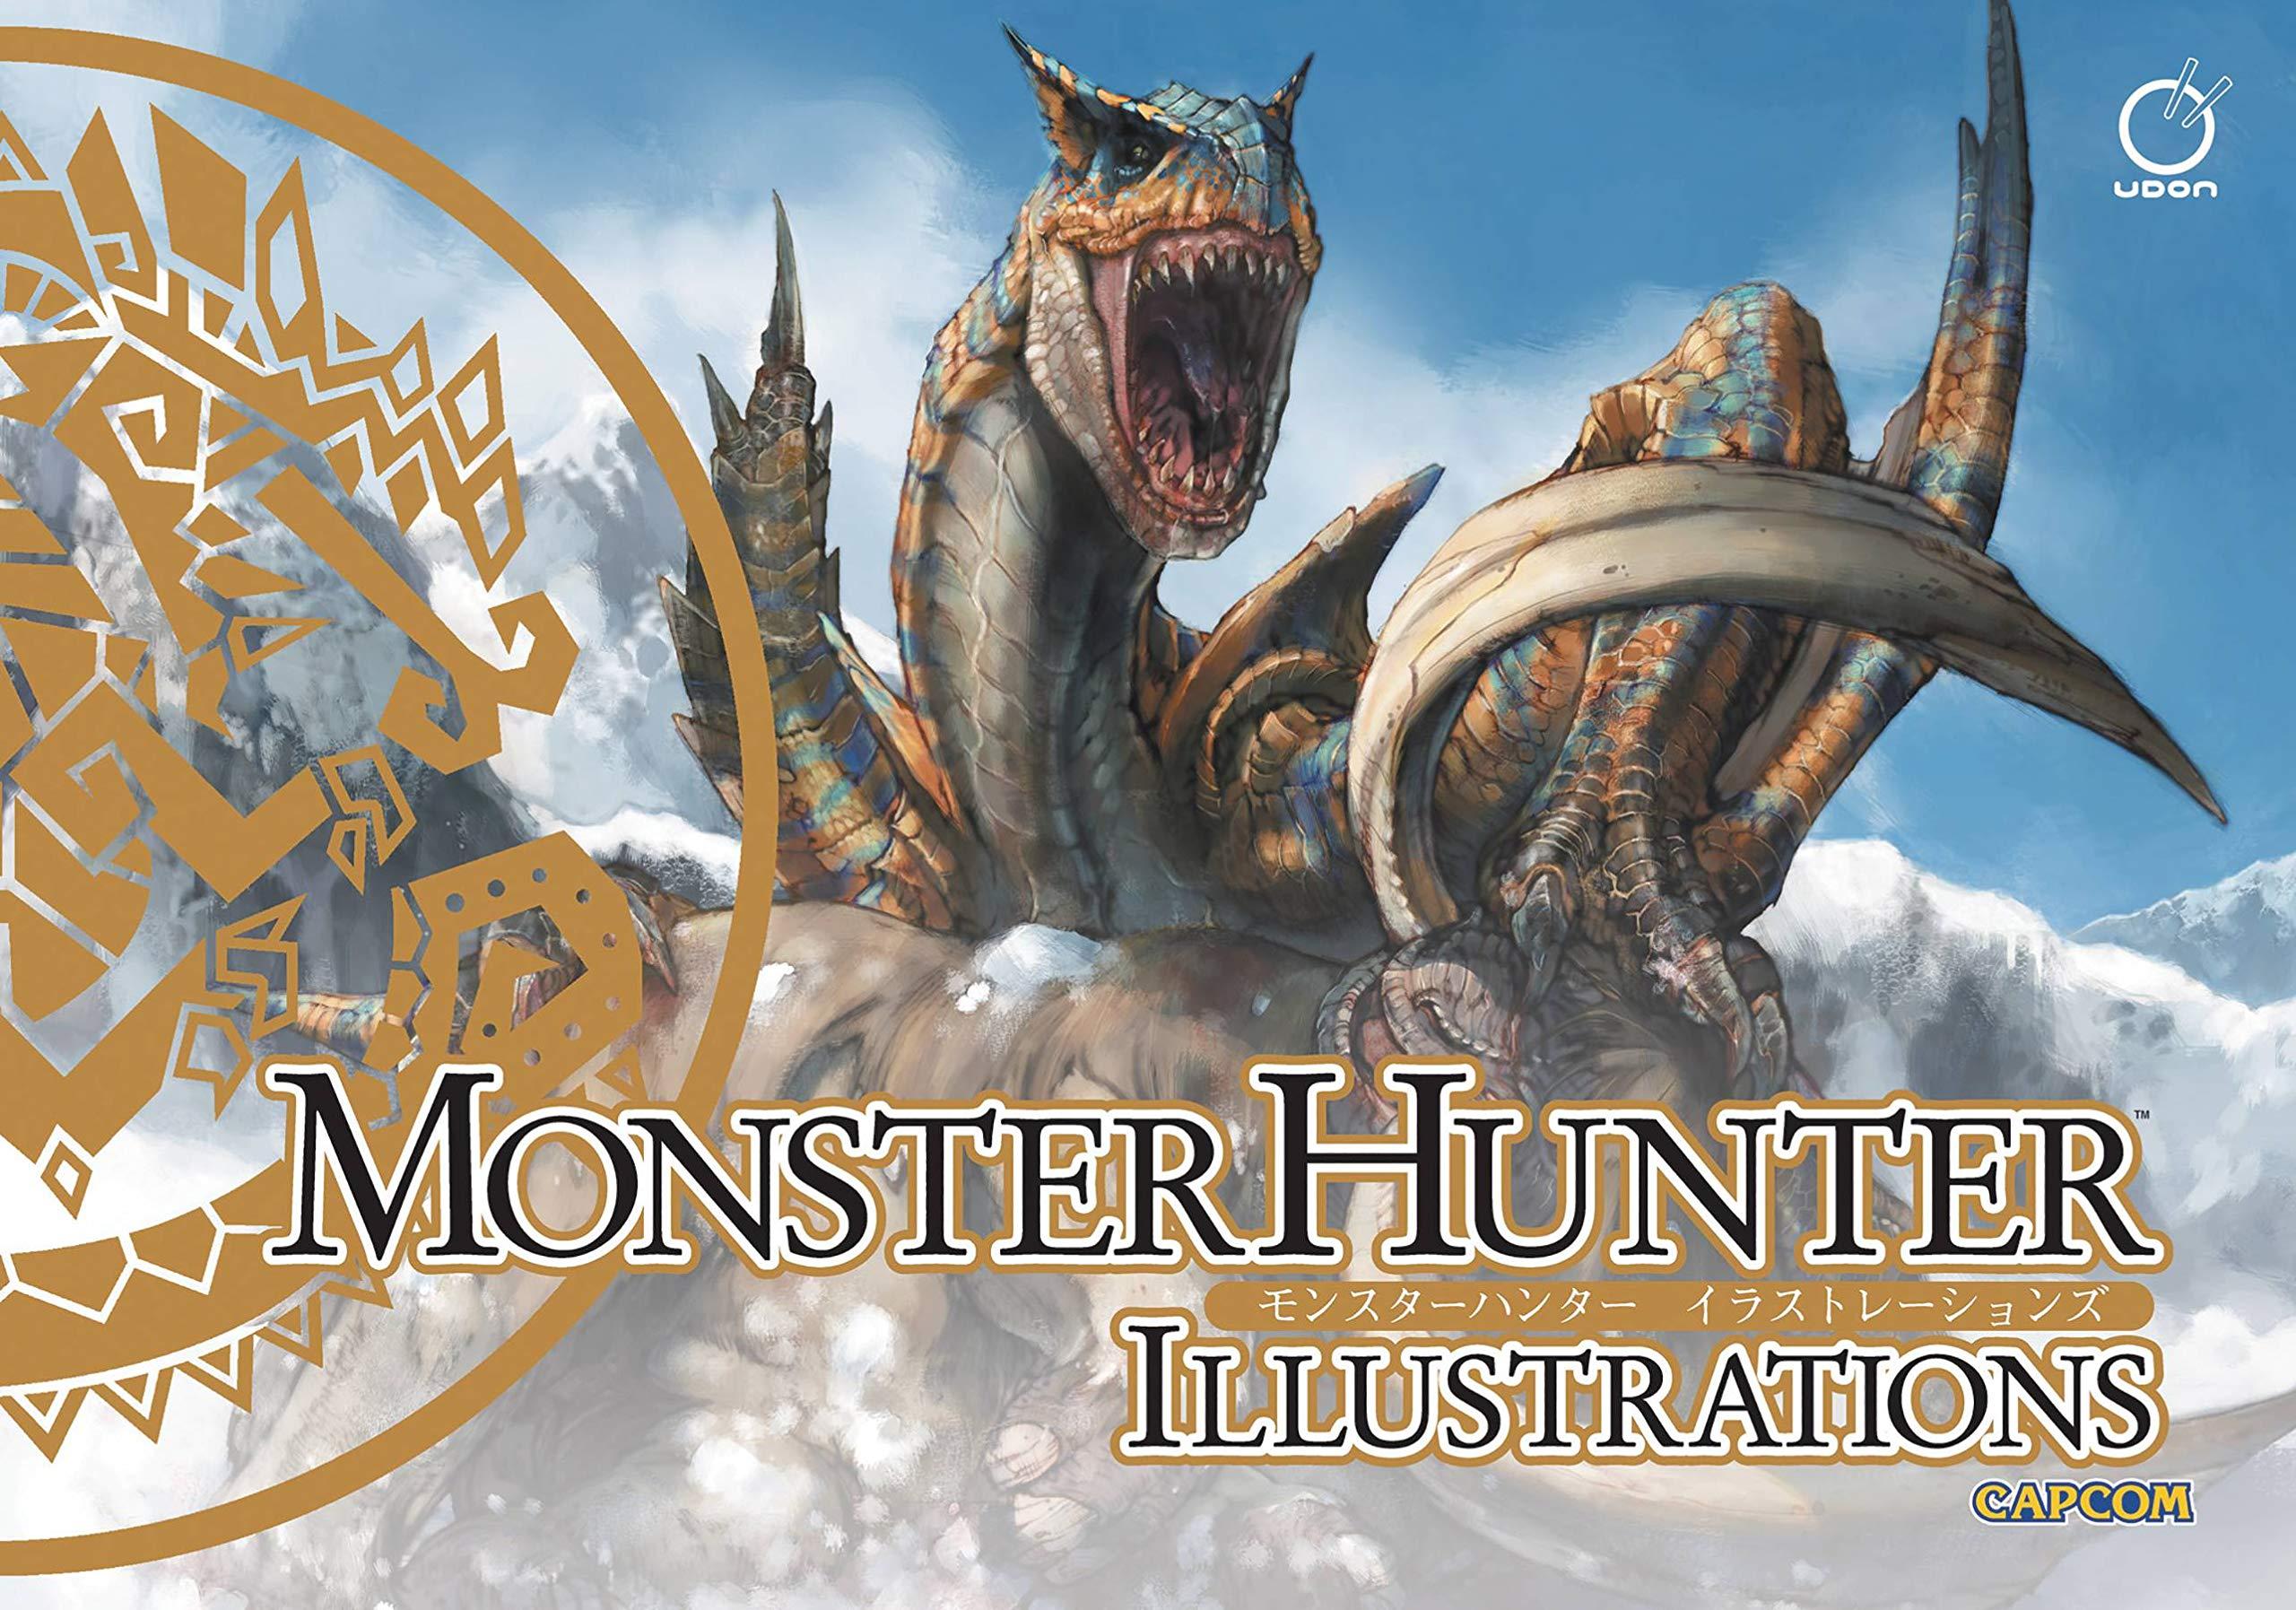 Monster Hunter Illustrations Amazon De Capcom Capcom Fremdsprachige Bucher